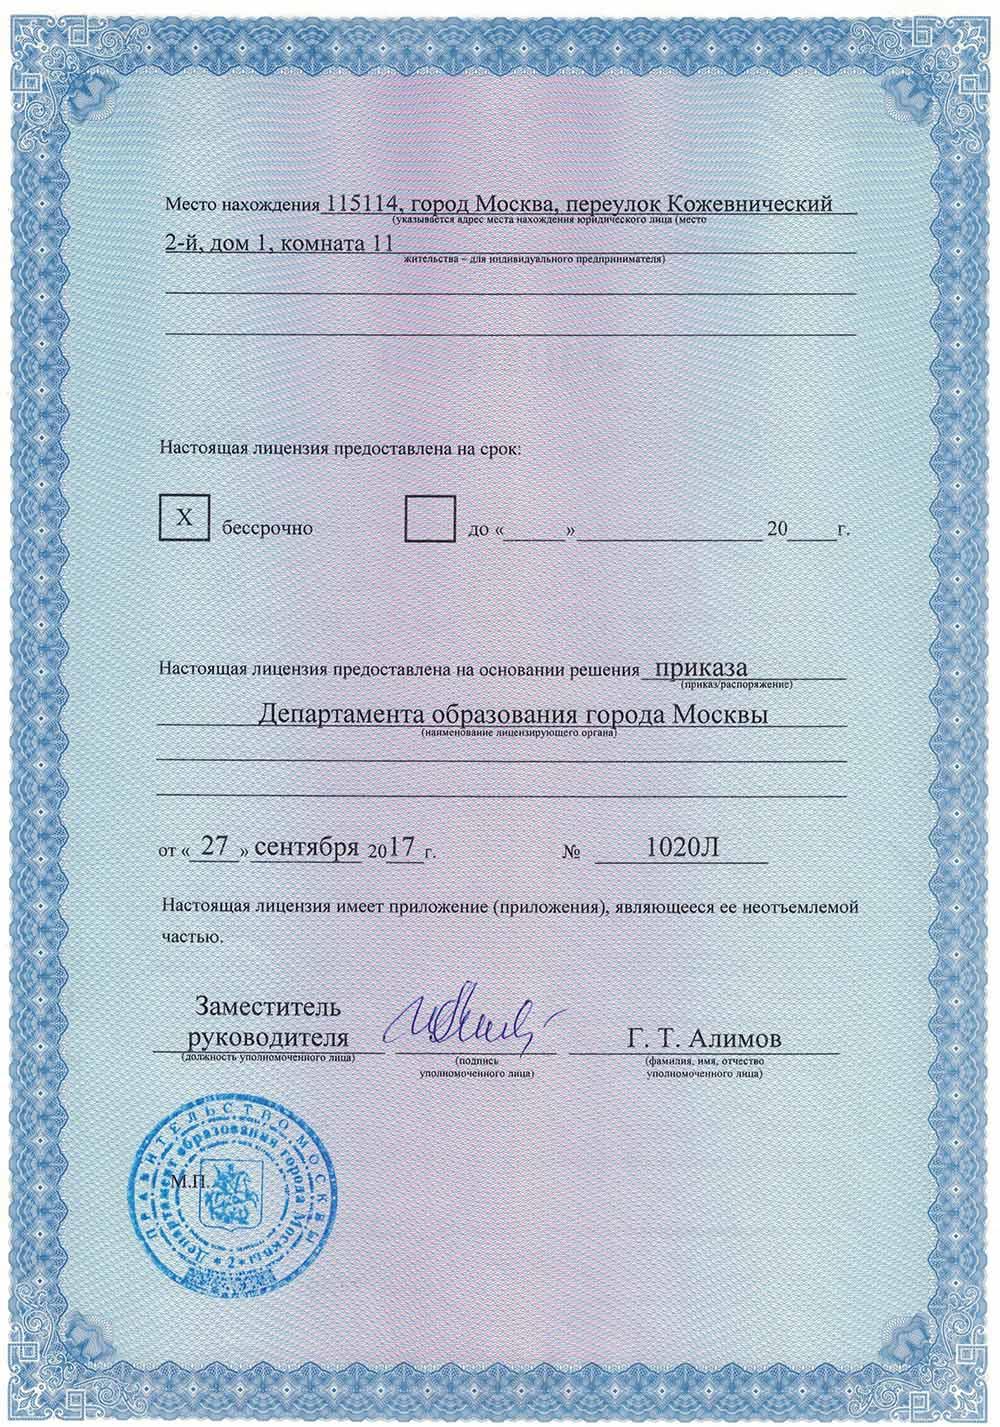 https://mtips.ru/images/upload/Лицензия%20ООО%20Хорс-Групп-2.jpg